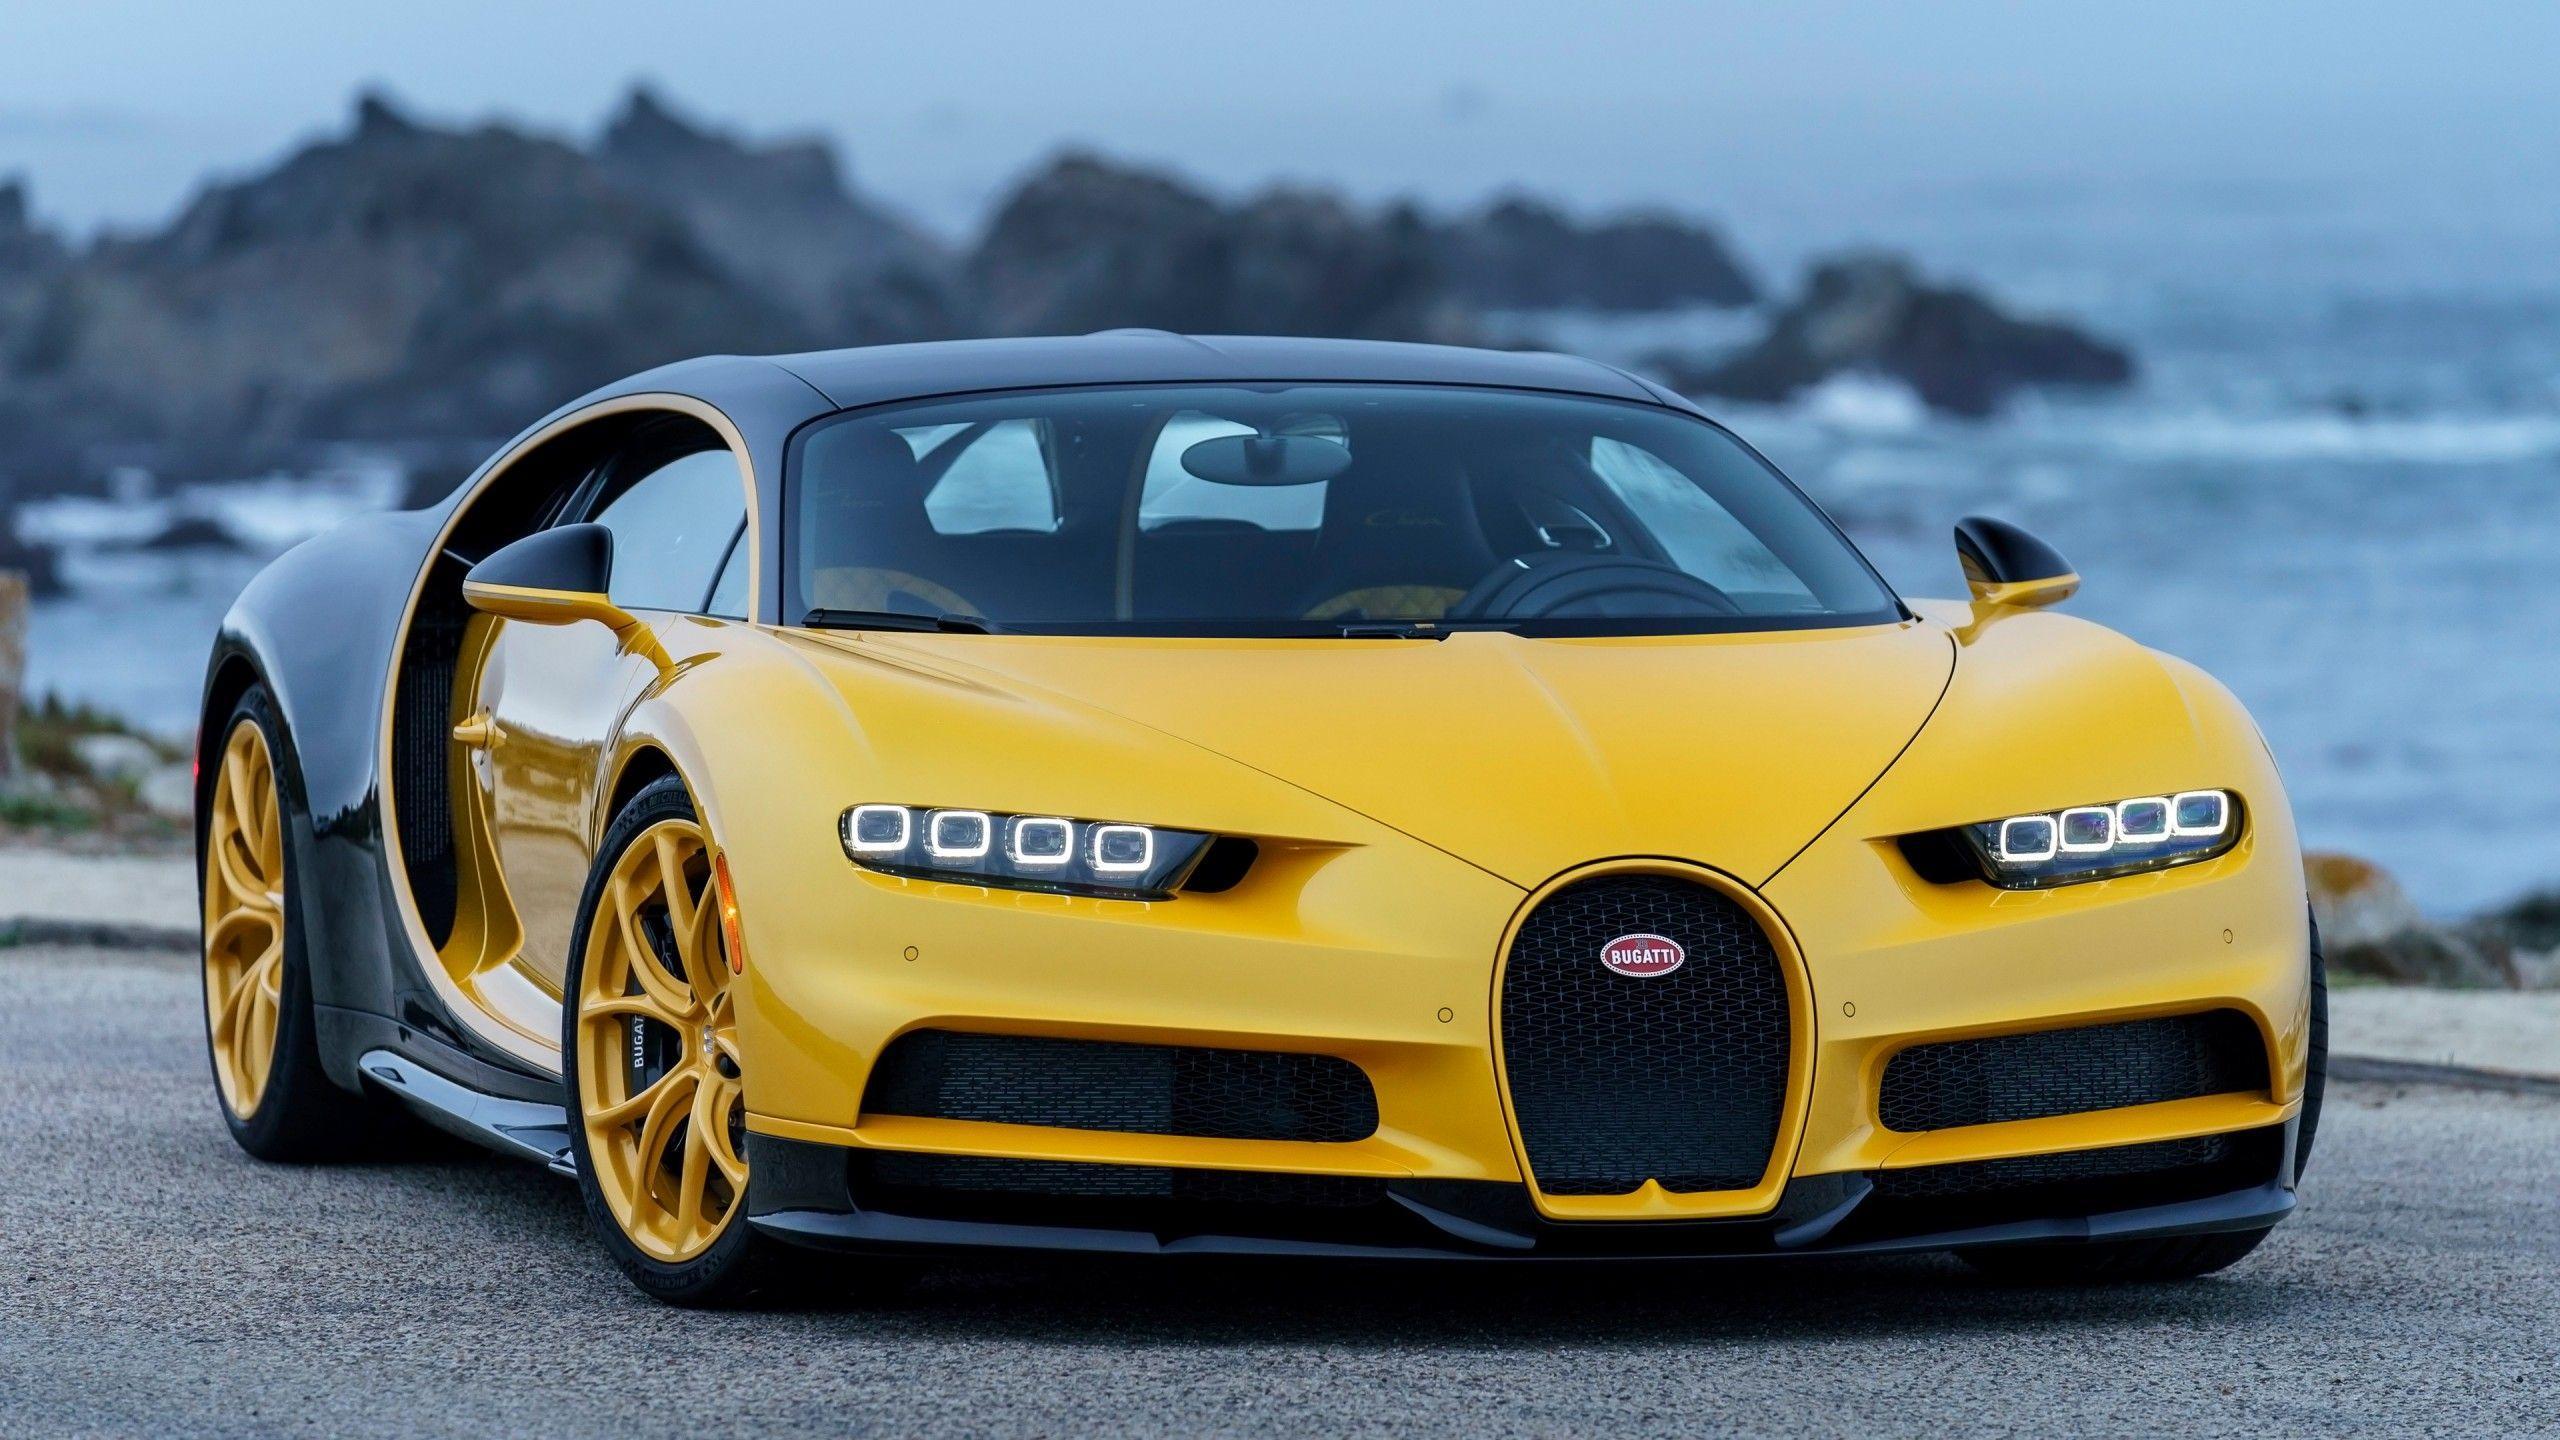 Bugatti Wallpapers Top Free Bugatti Backgrounds